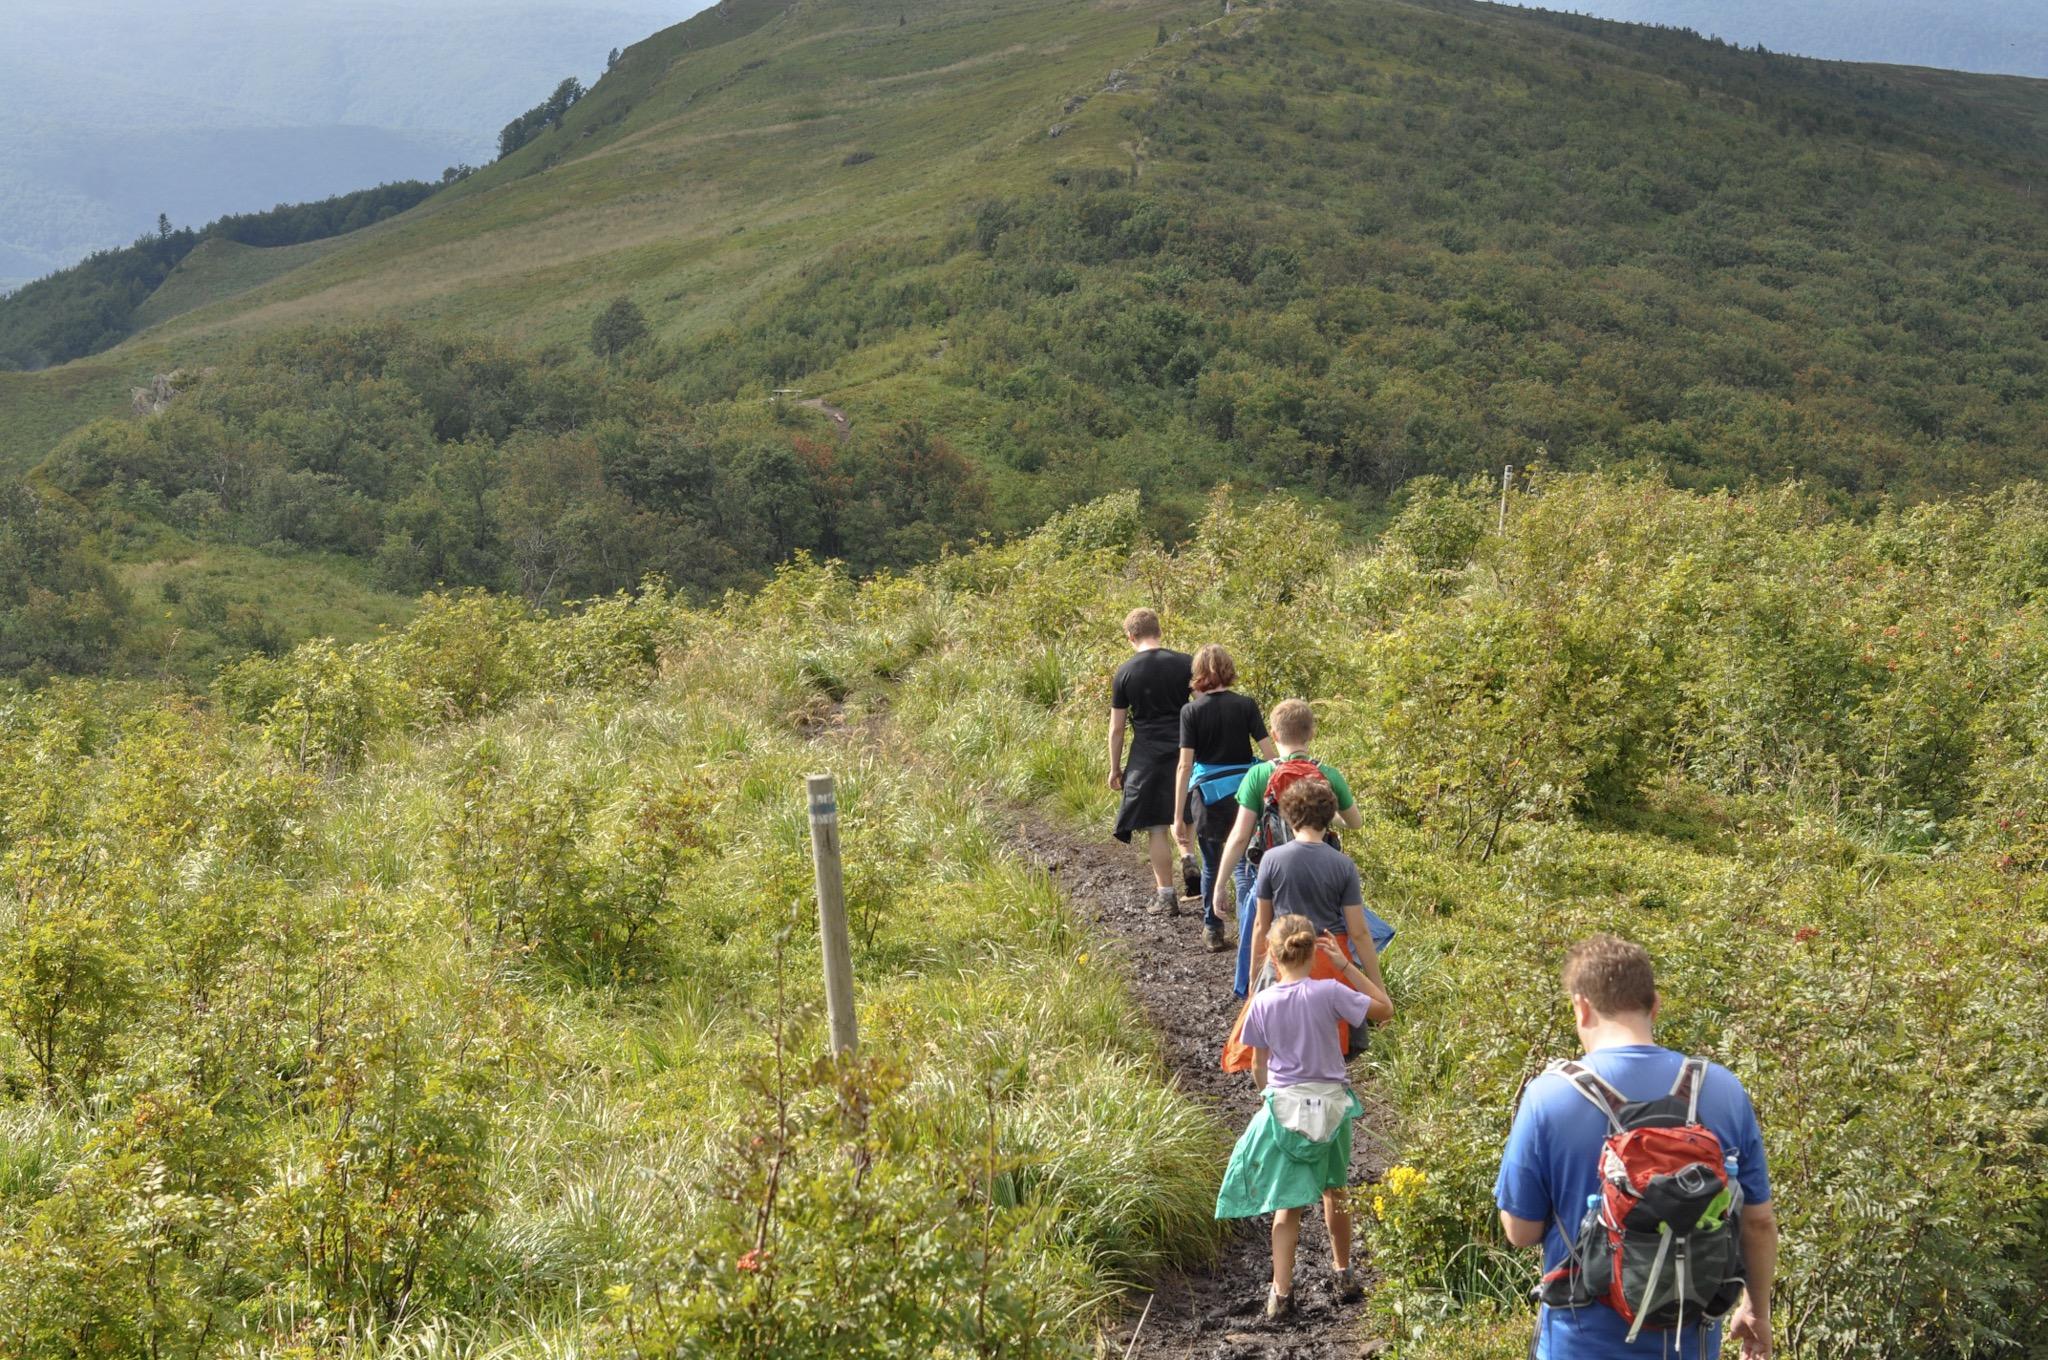 Hike to Bukowe Berdo, Bieszczady Mountains, Poland